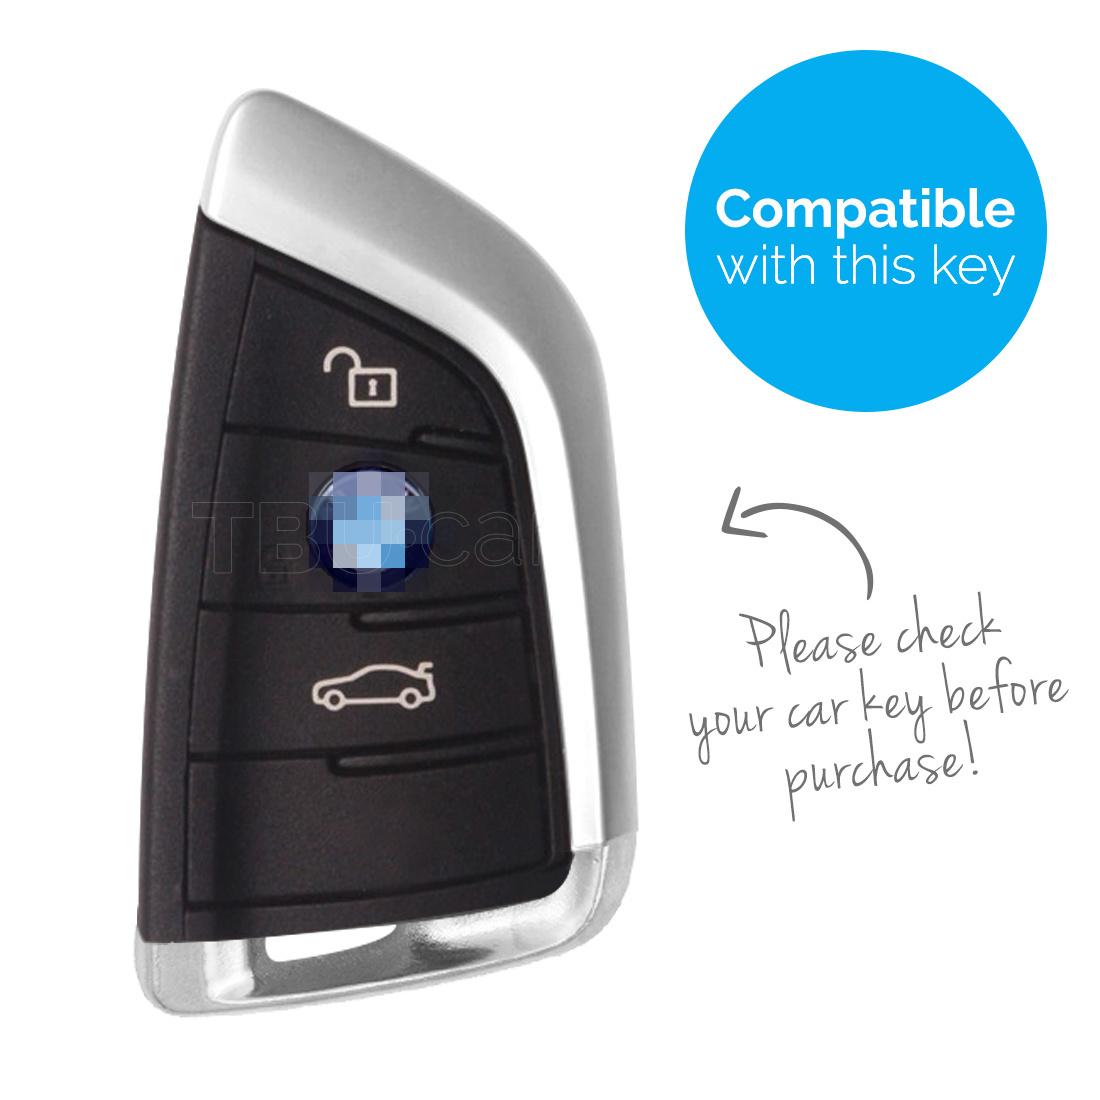 TBU car TBU car Car key cover compatible with BMW - TPU Protective Remote Key Shell - FOB Case Cover - Chrome